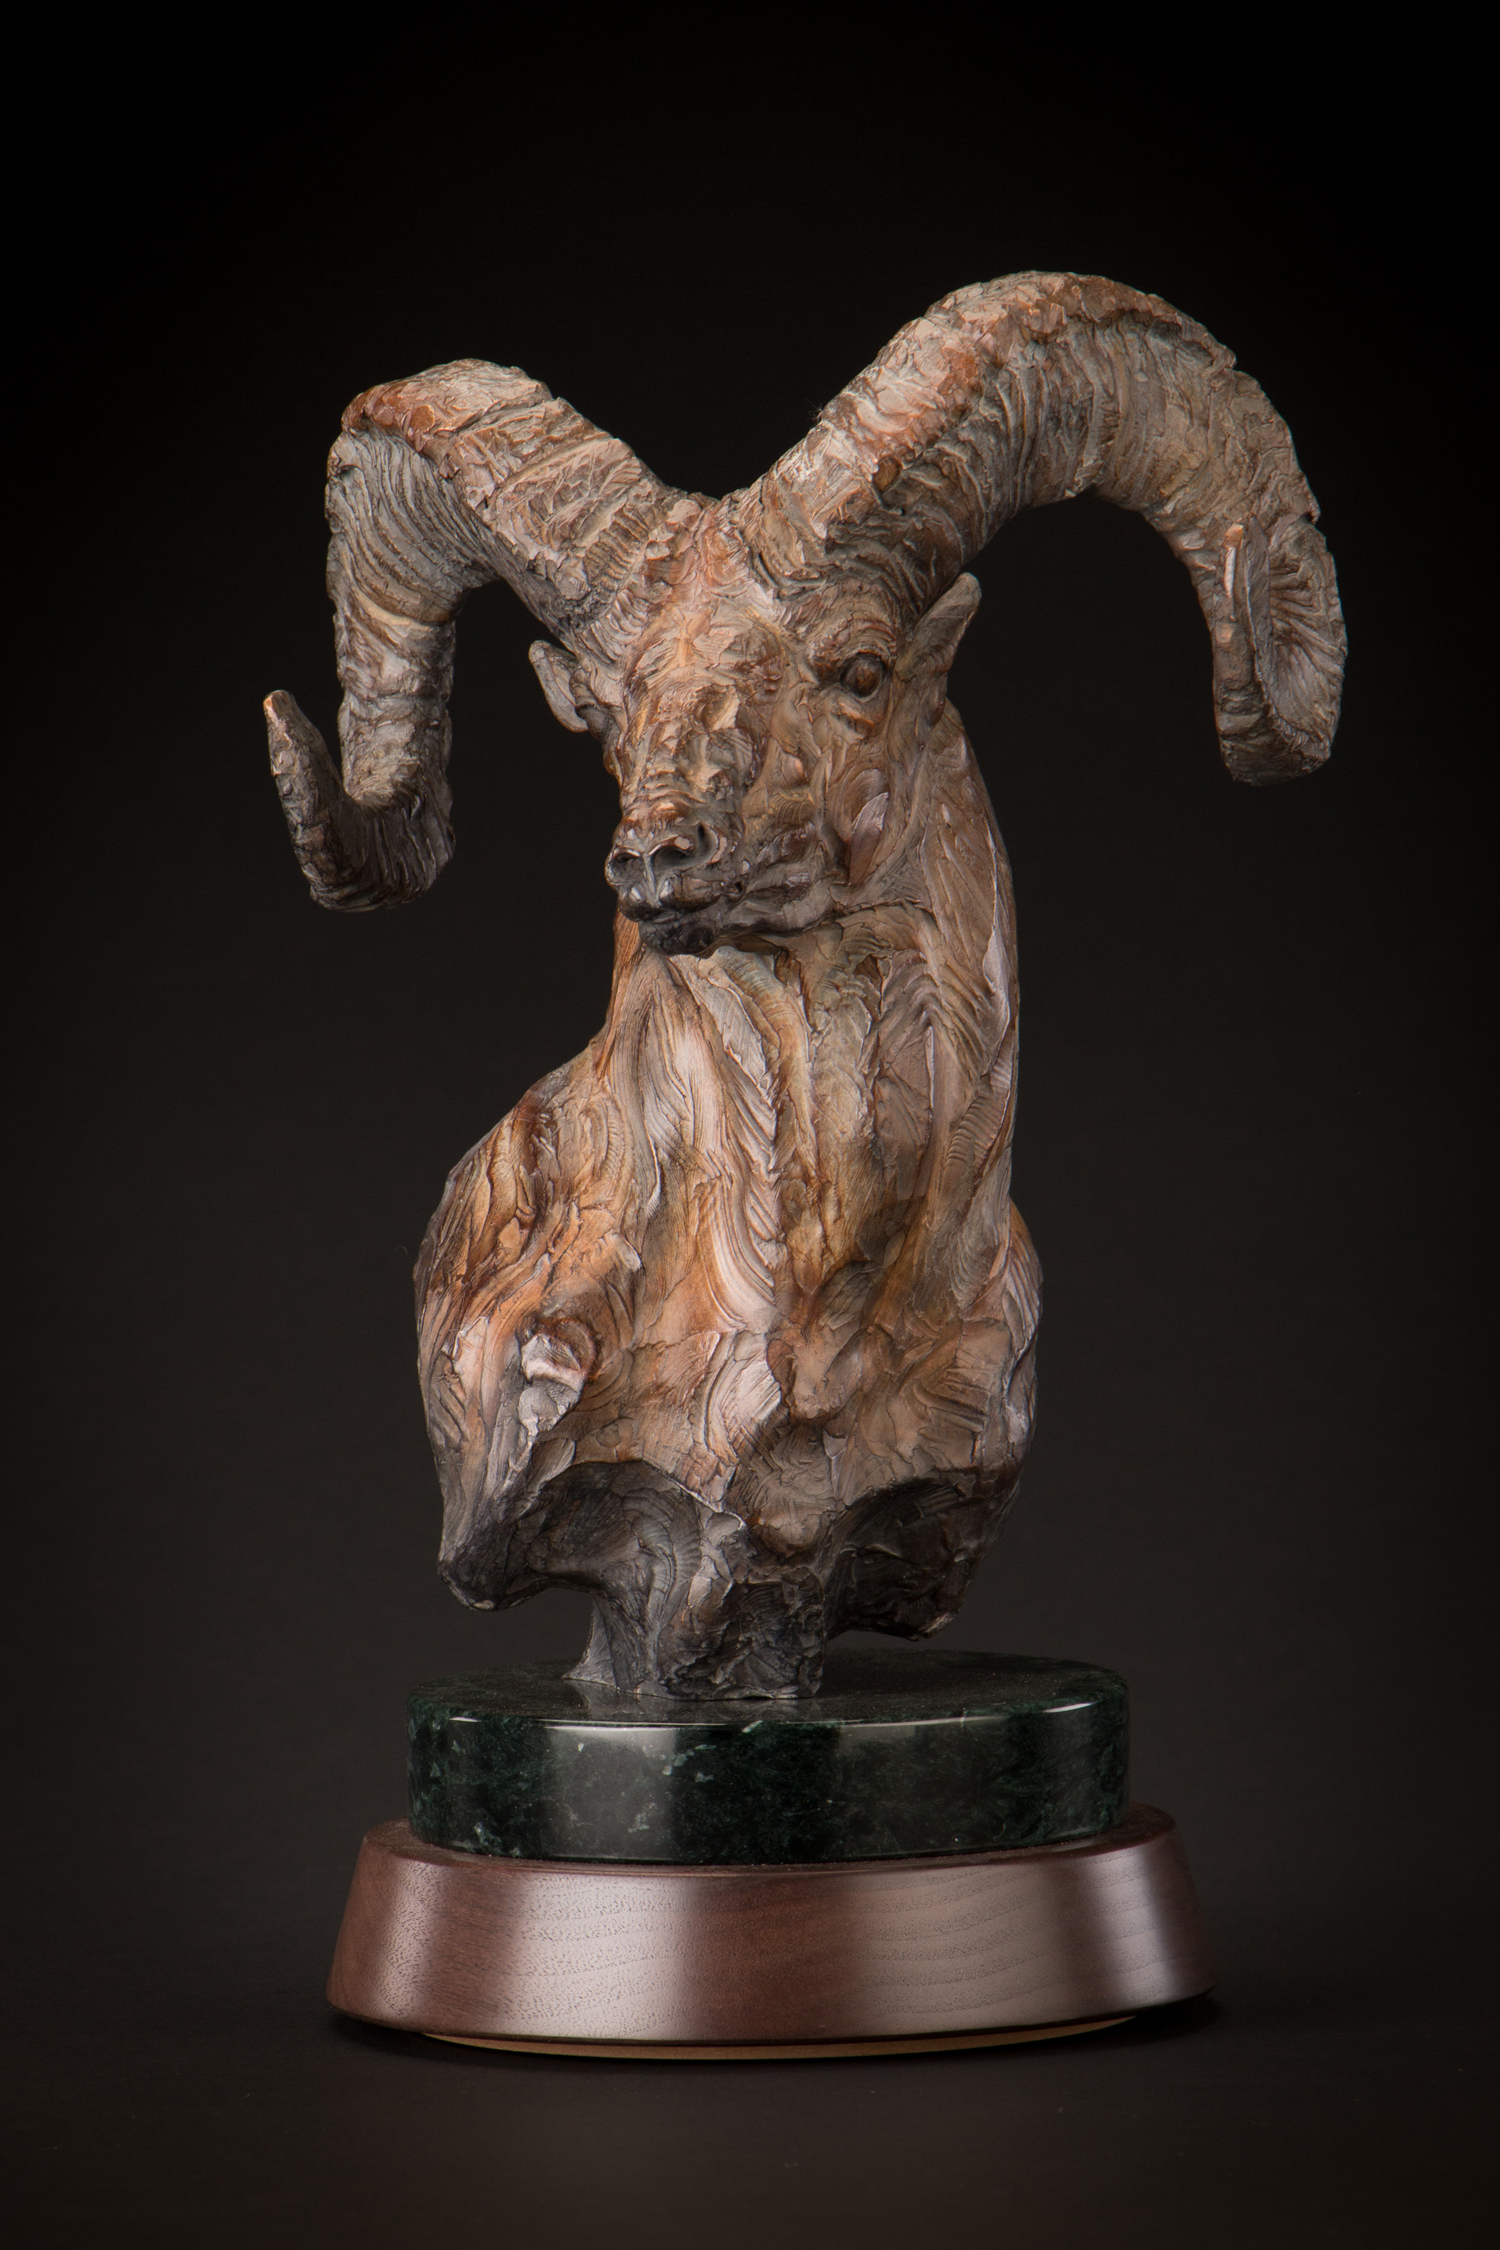 "Highborn | 15"" x 9"" x 7.75"" | Bronze | Edition of 35 | $2,600"